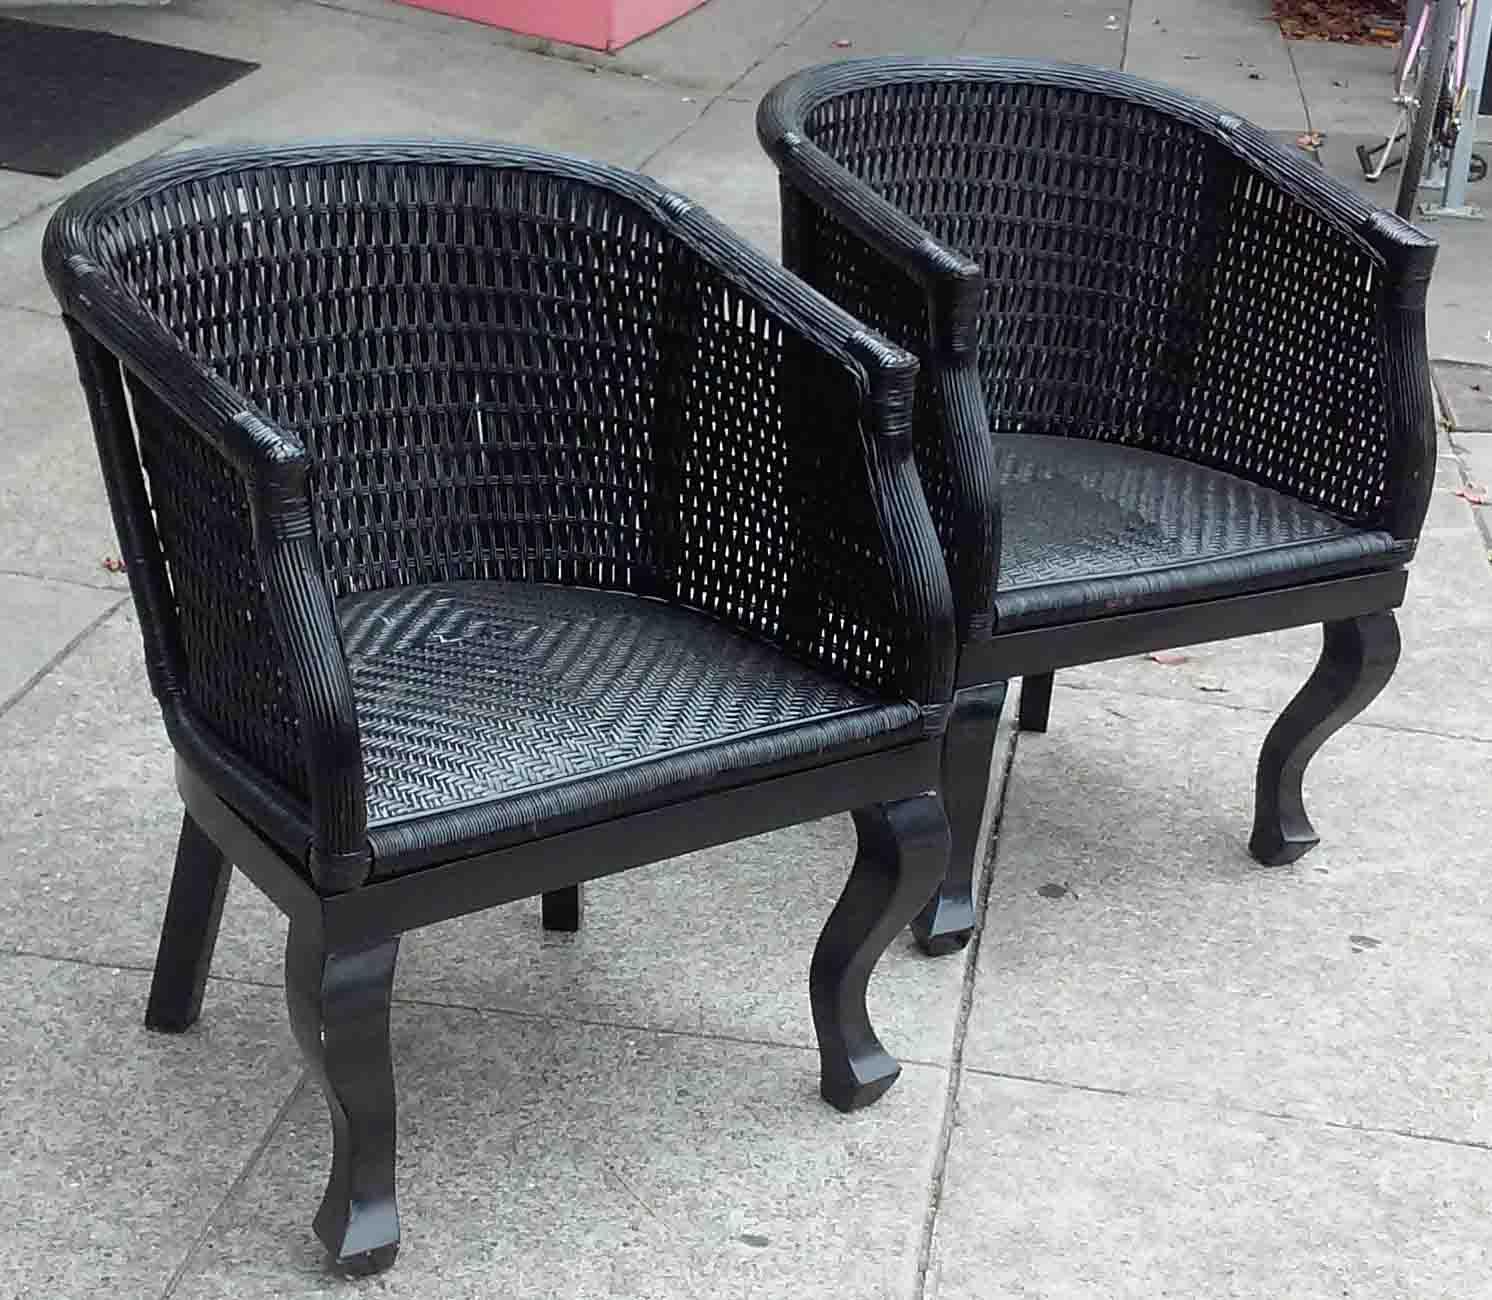 Uhuru Furniture Amp Collectibles Sold Black Wicker Patio